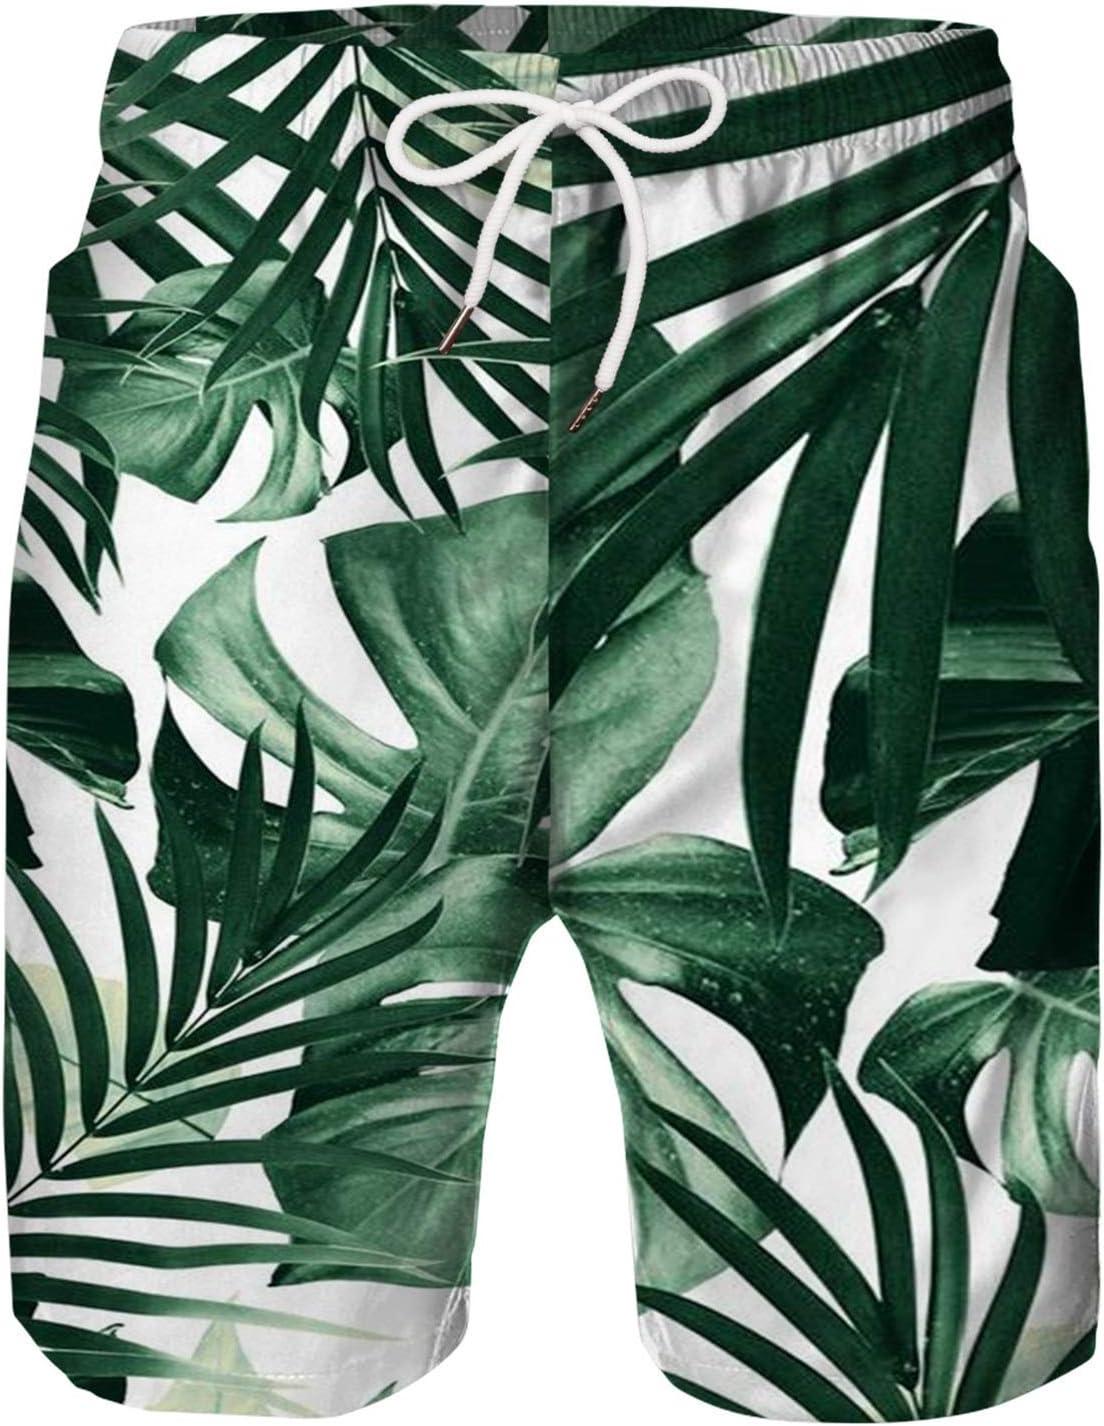 Board Shorts Mens, Mens Swim Shorts,Parent-Child Wear, Leisure Shorts,Breathable Mesh Quick Dry (Color : D, Size : Adult-Medium)